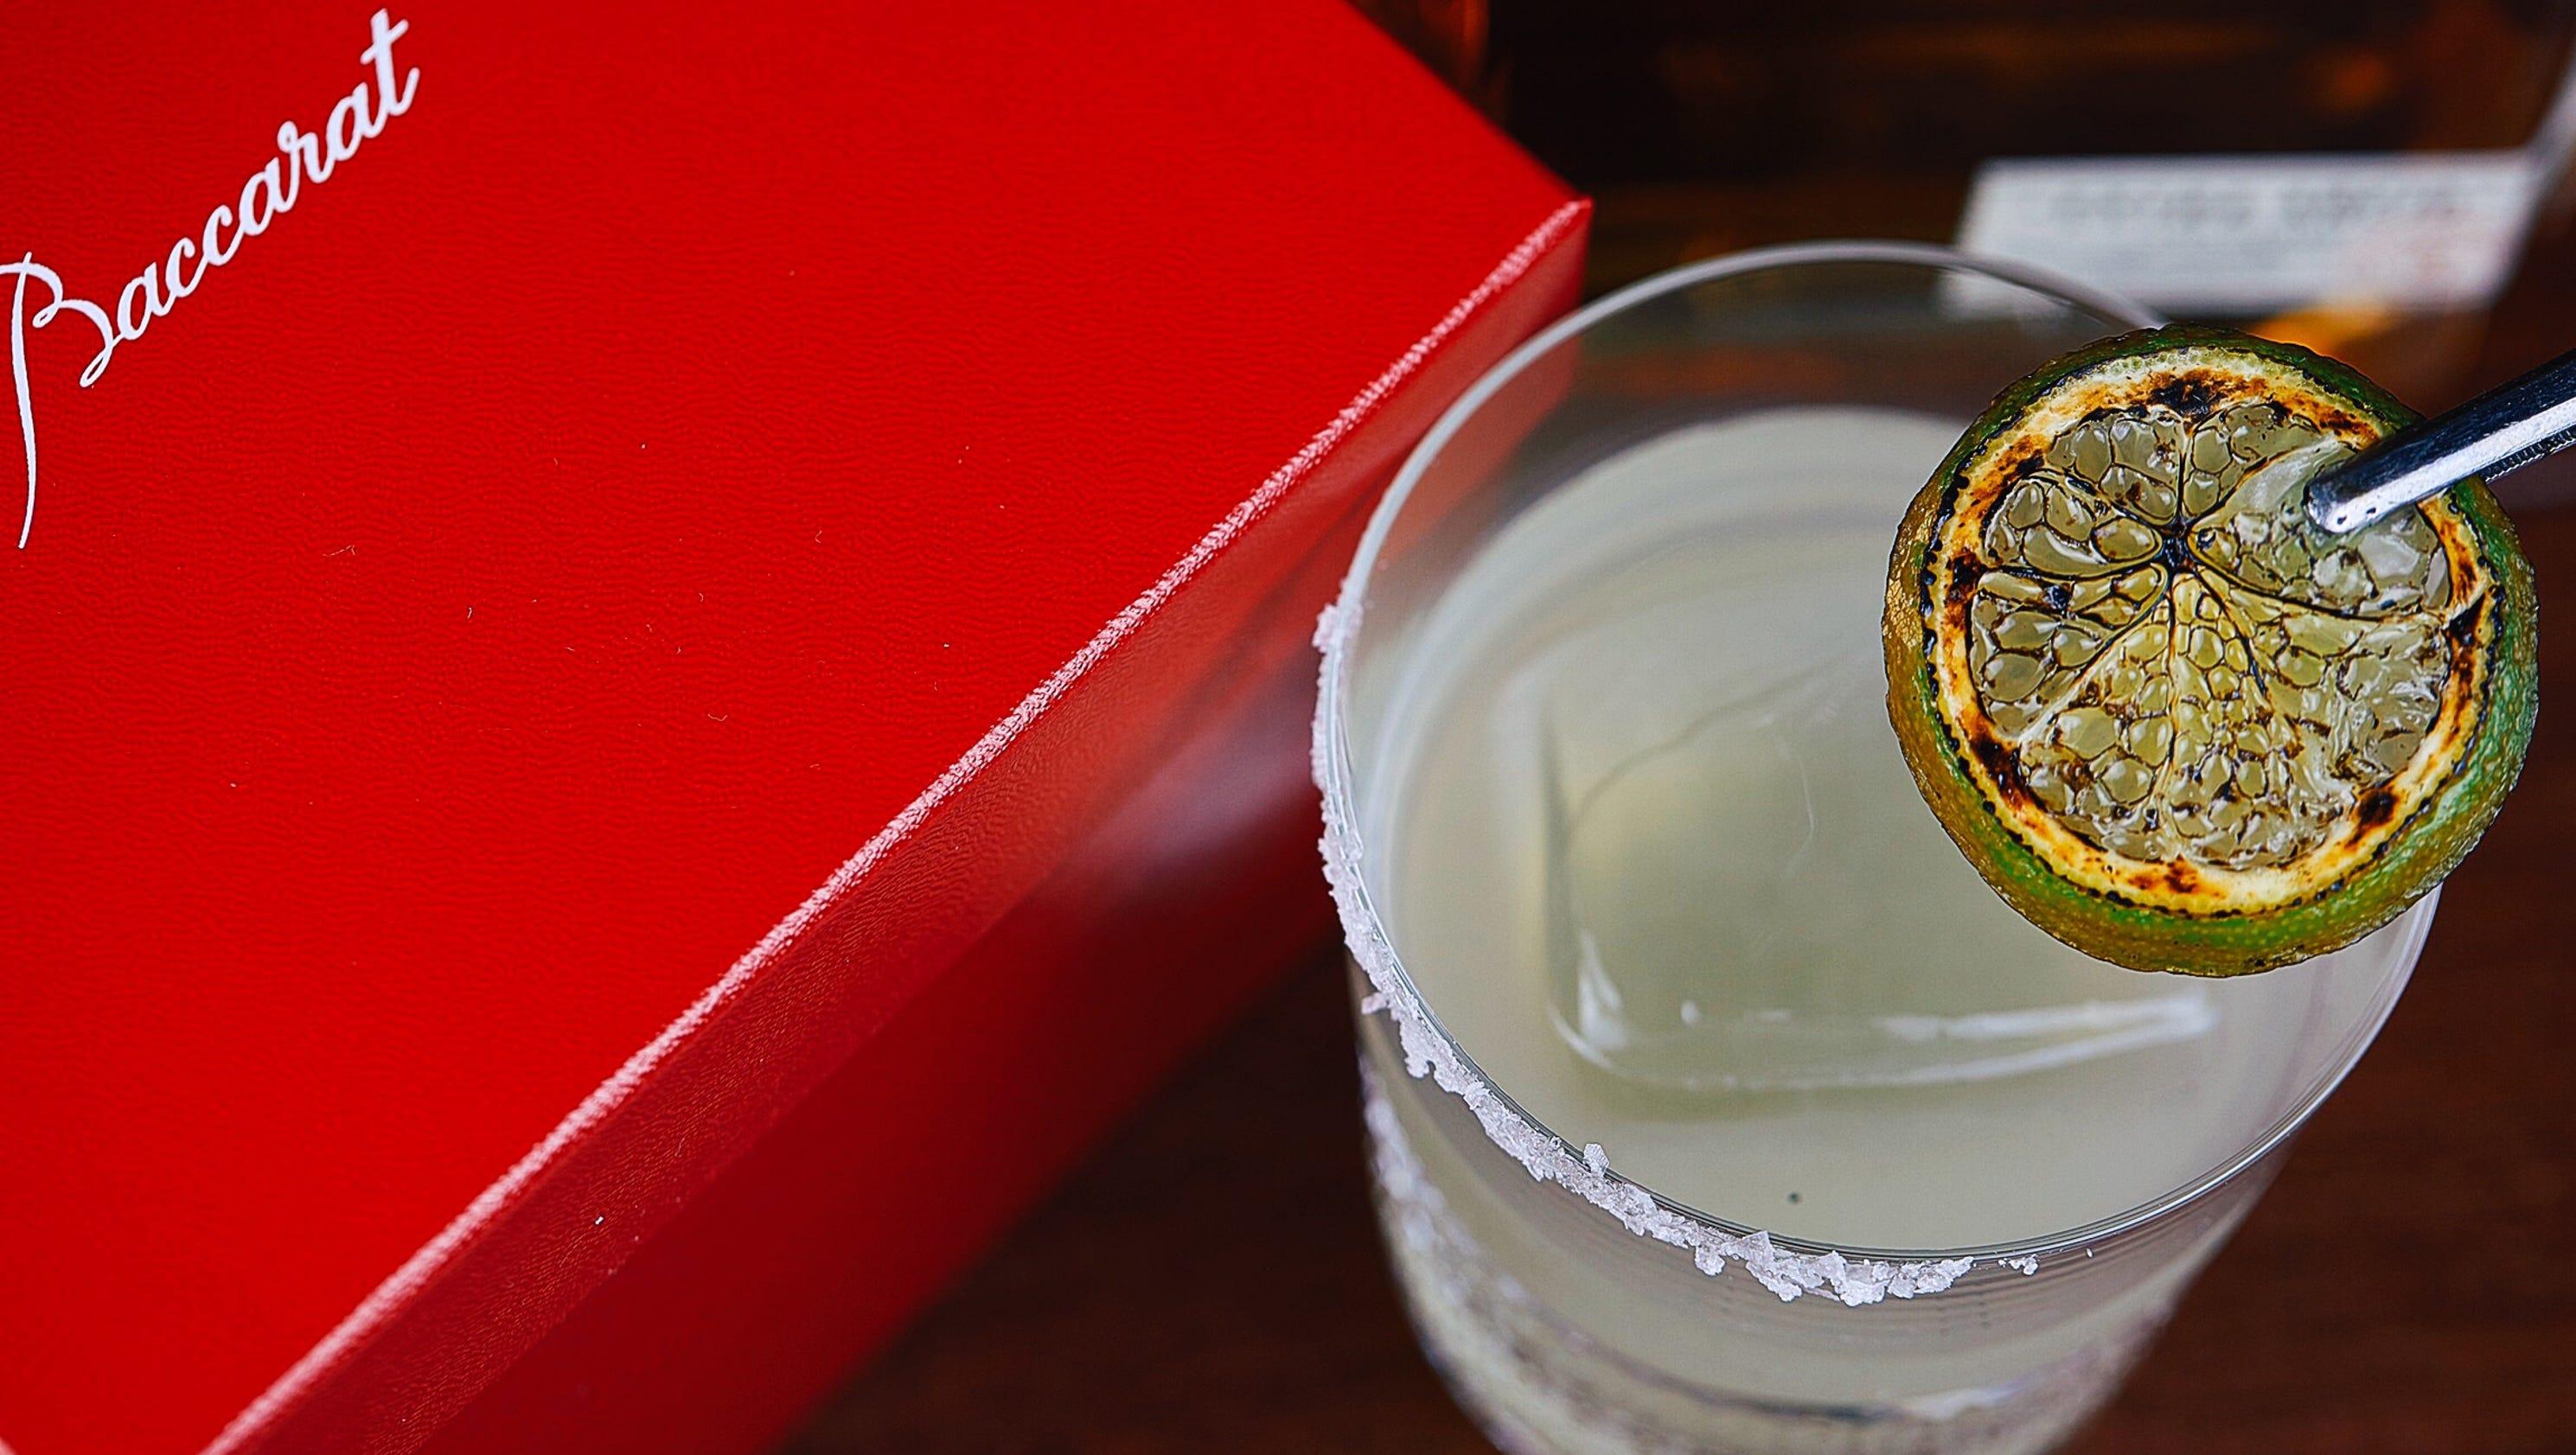 Here\'s 5 cool margaritas spots for Cinco de Mayo